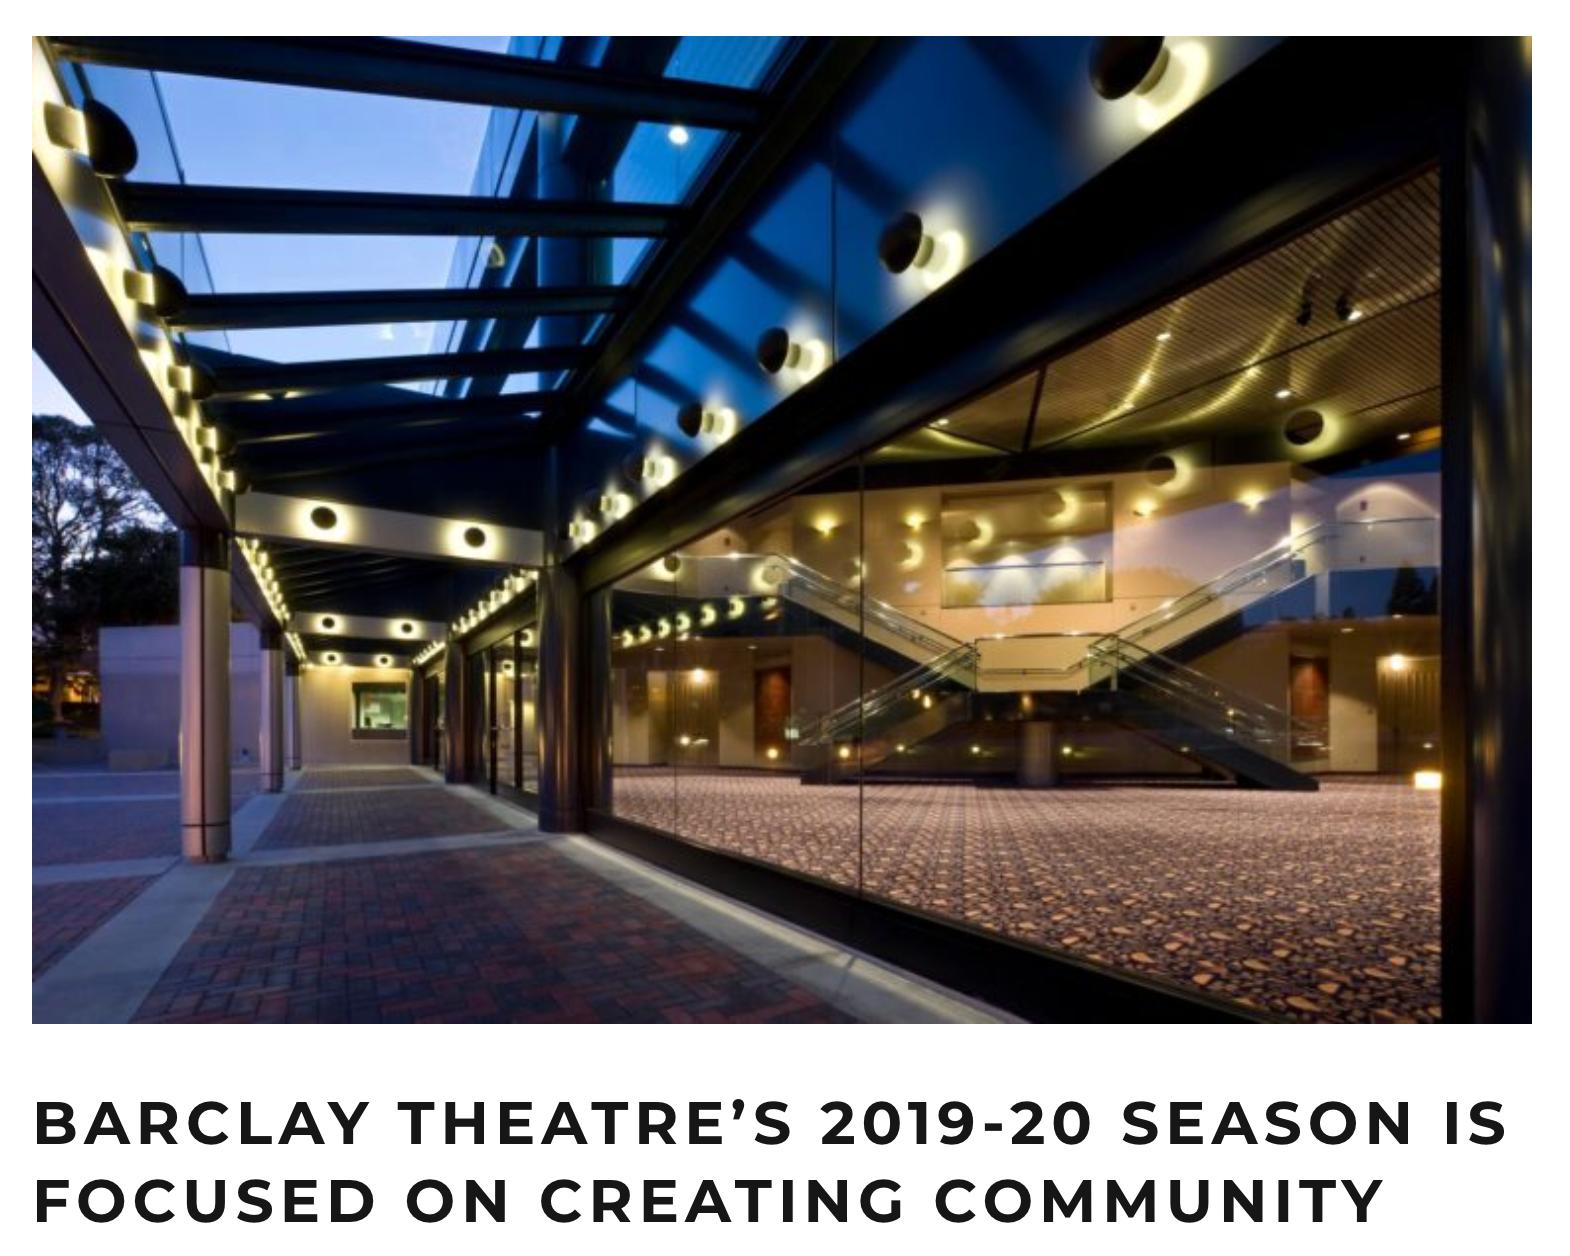 Barclay Theatre's 2019-20 Season is Focused on Creating Community